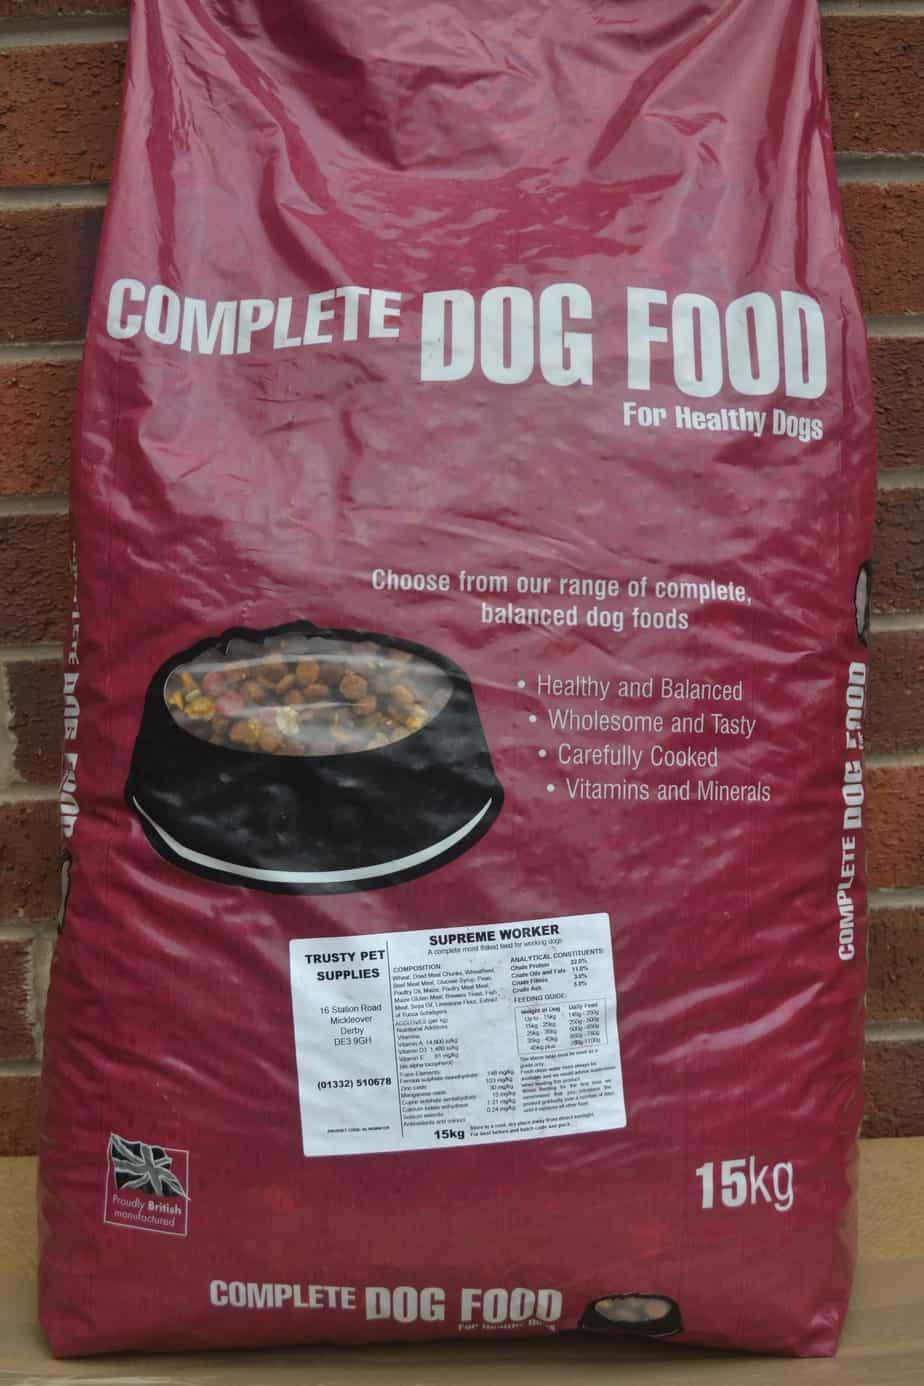 Trusty Pet Supplies Supreme Worker Trusty Pet Supplies